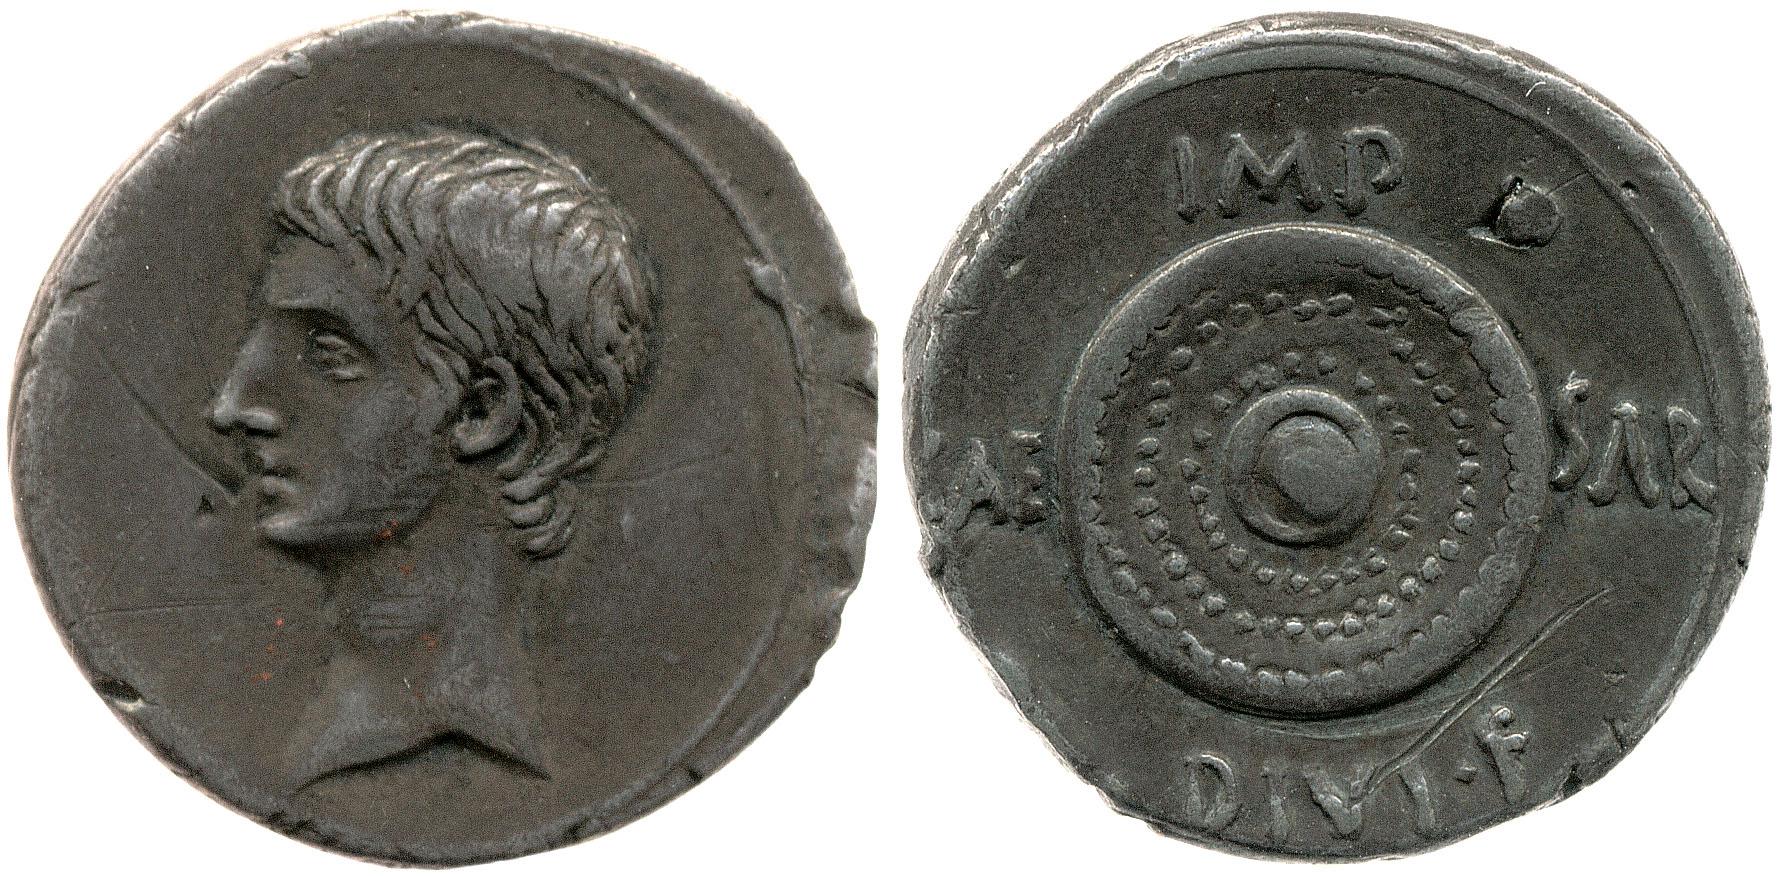 You are currently viewing 2036AU – Denier Octave – Caius Julius Cæsar Octavianus